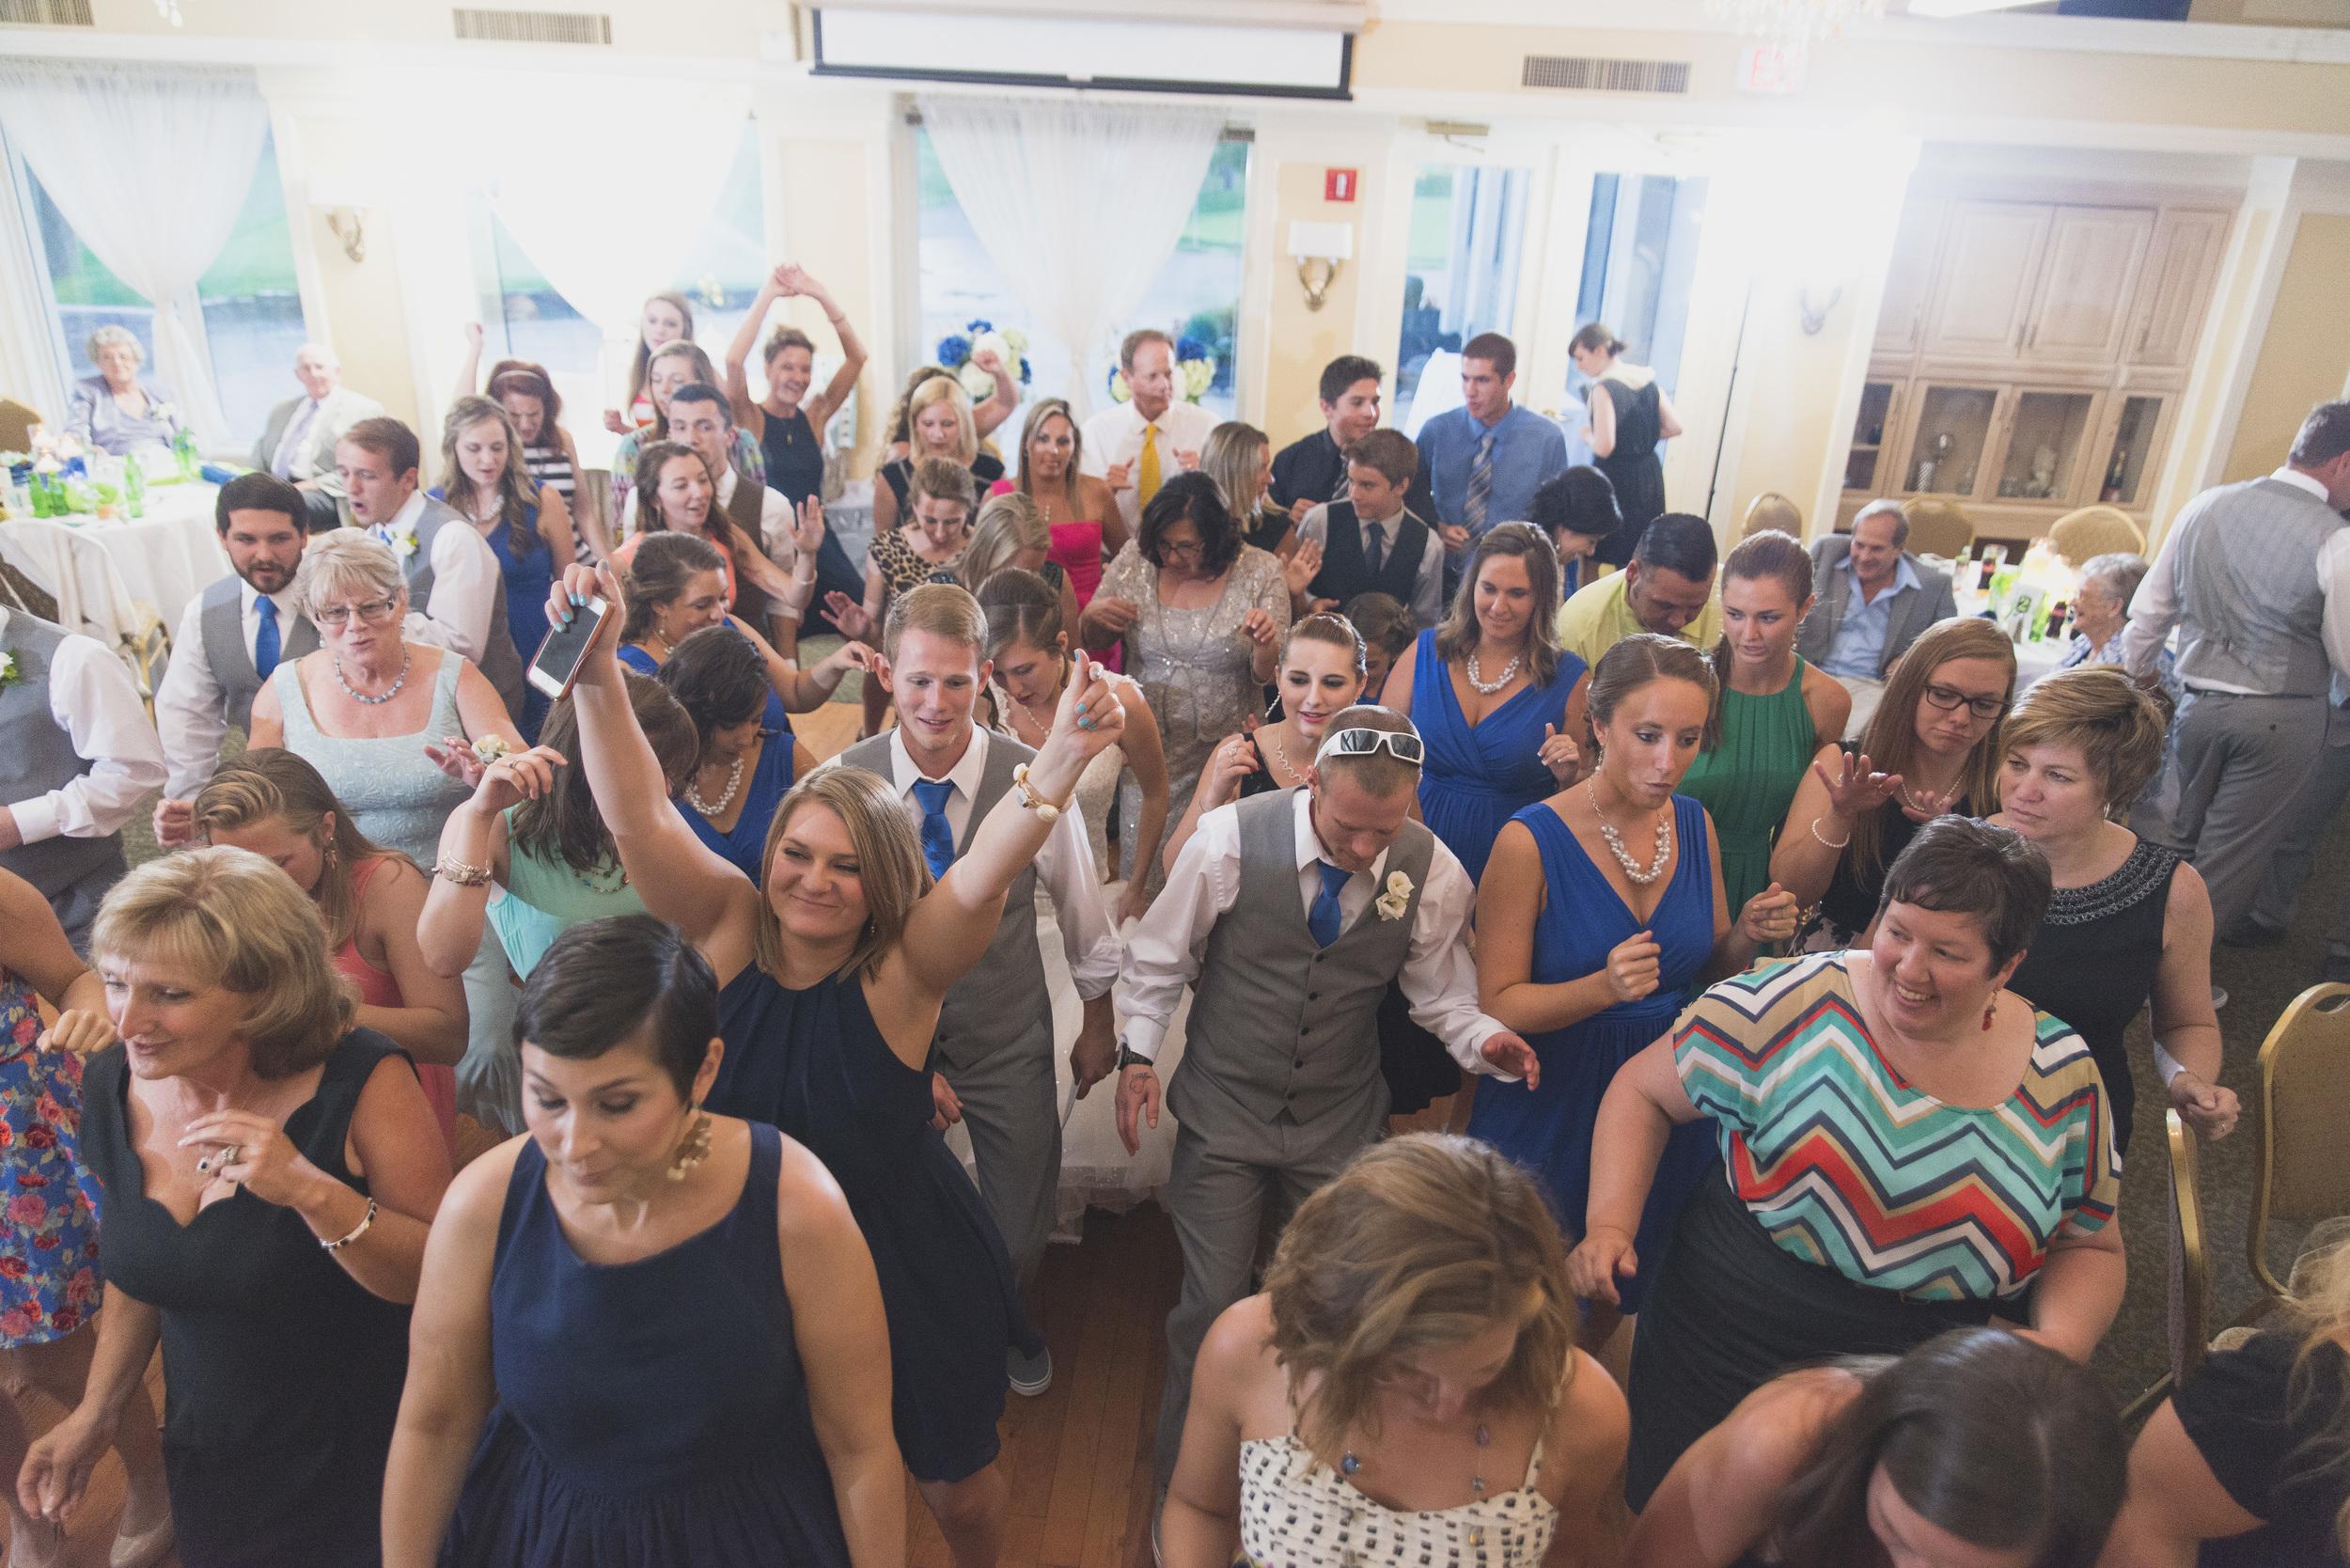 New_jersey_blue_heron_pines_wedding20150529_0604.jpg